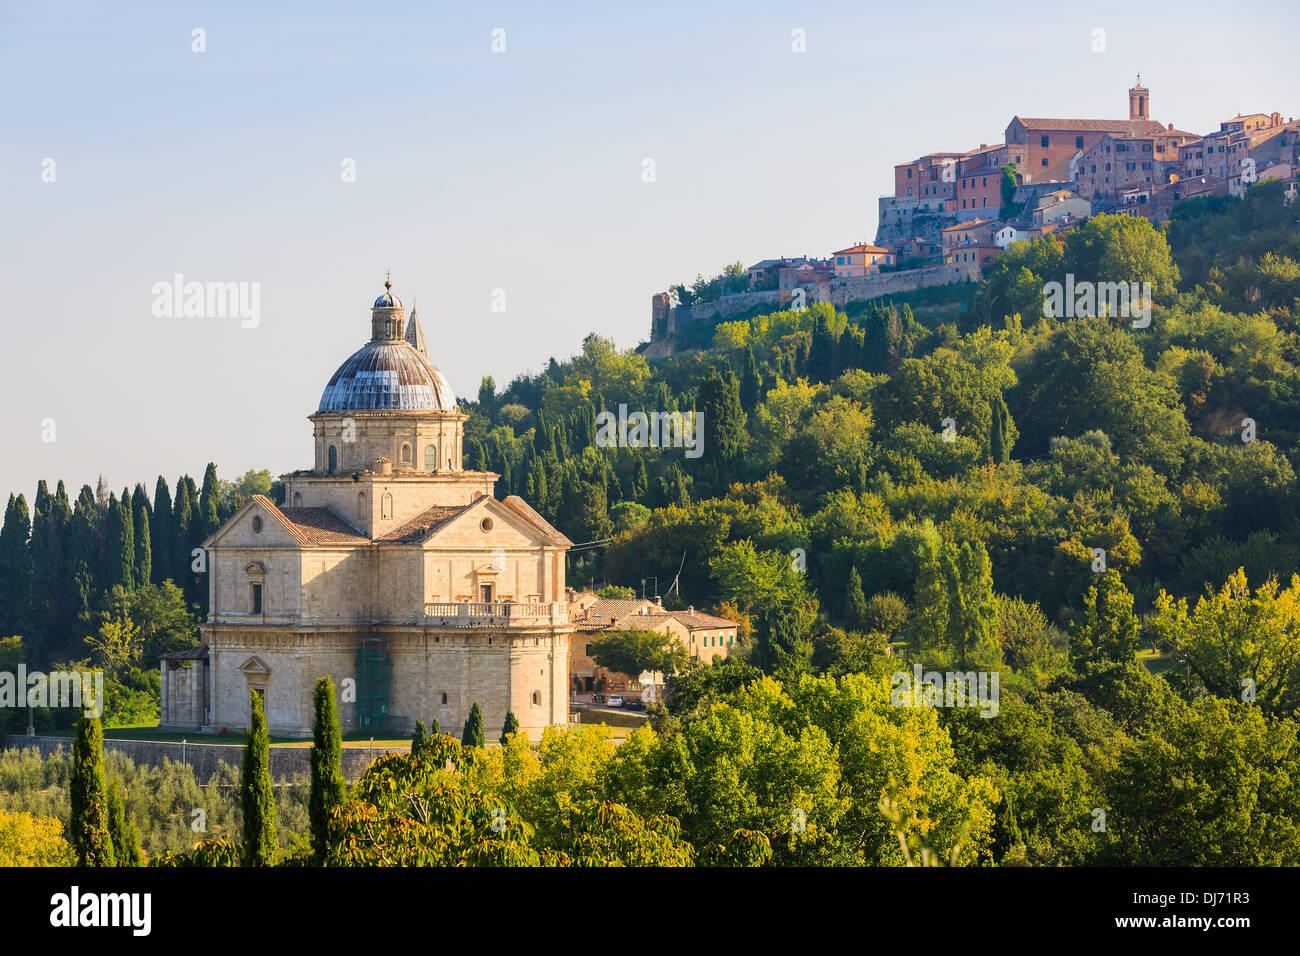 The Sanctuary of San Biagio, Montepulciano, Italy - Stock Image